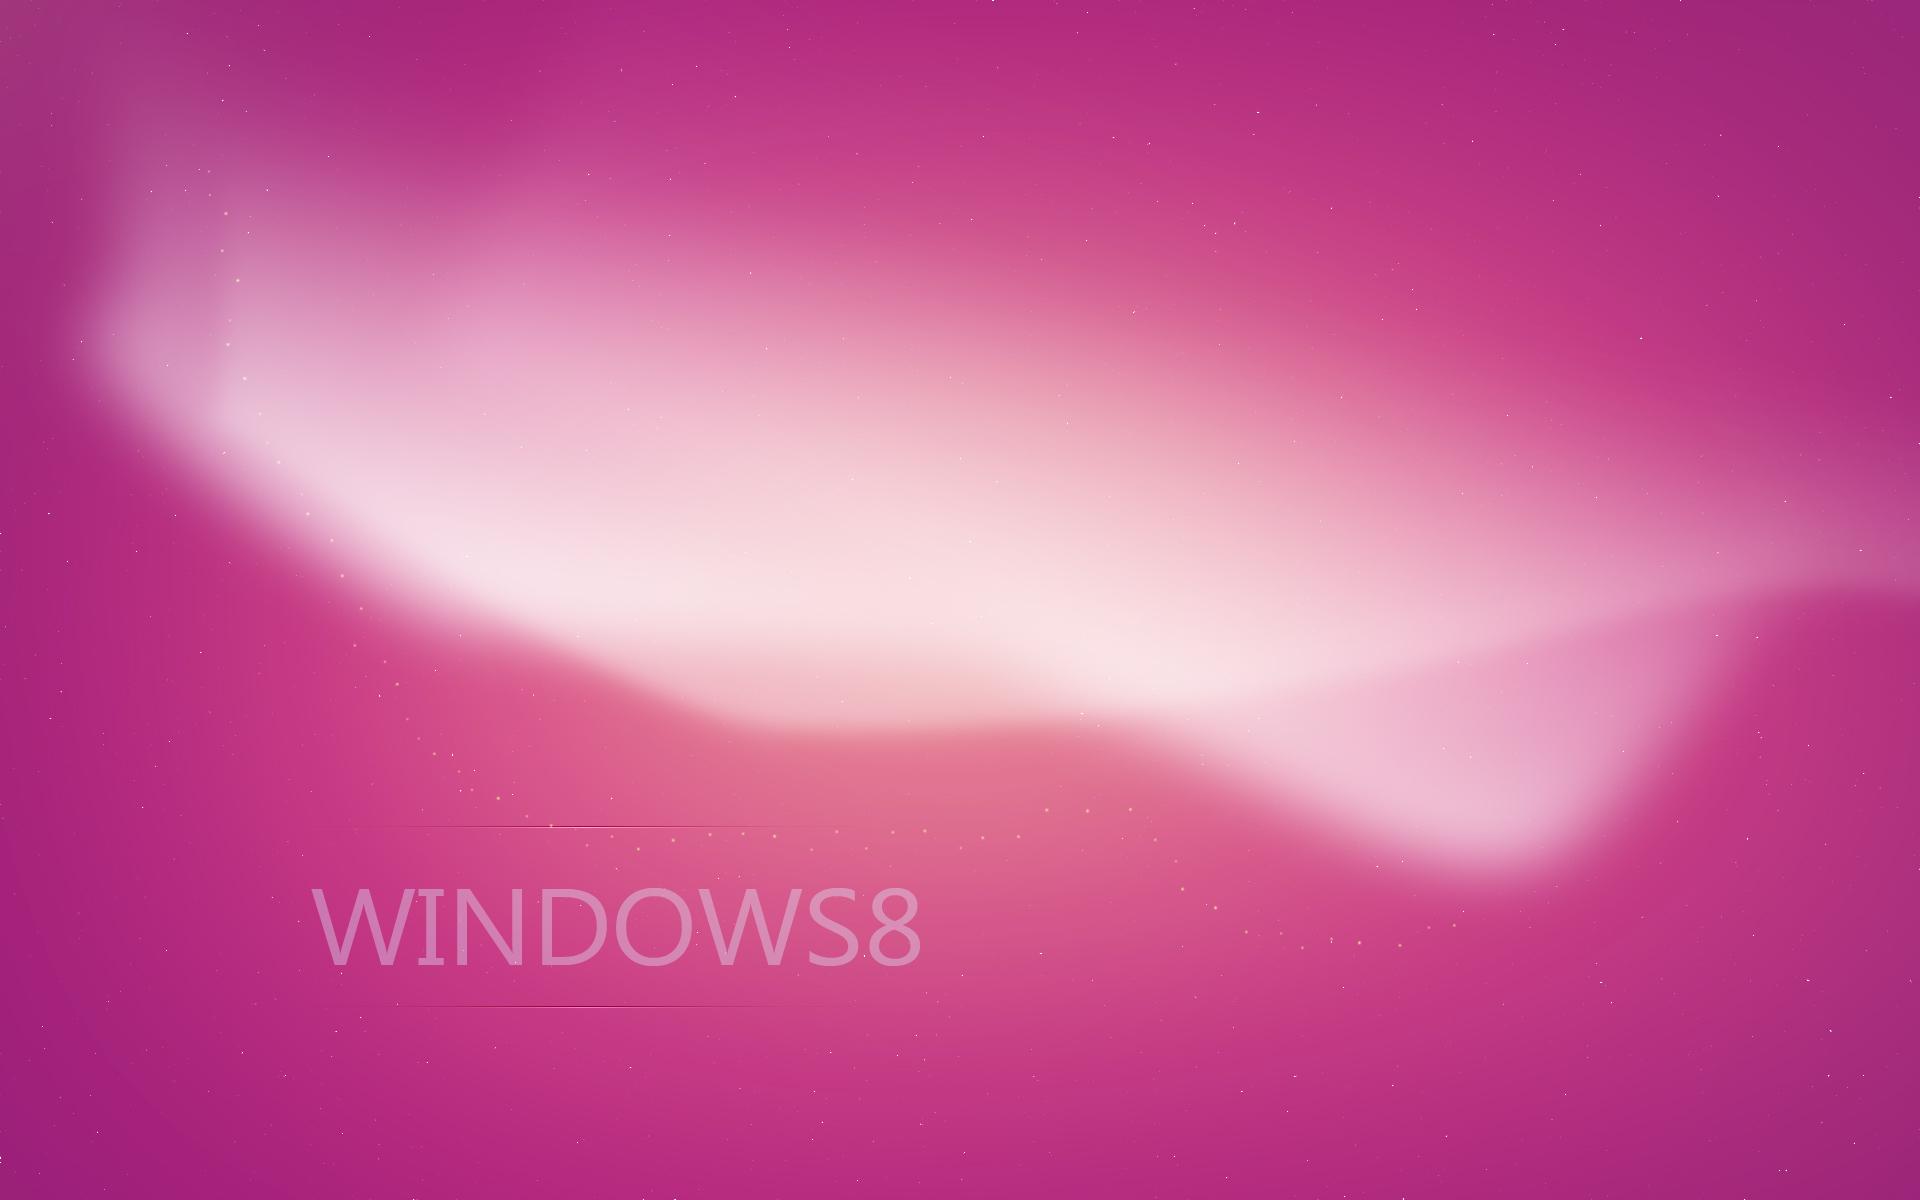 windows8 wallpaper by abdelhakimknis